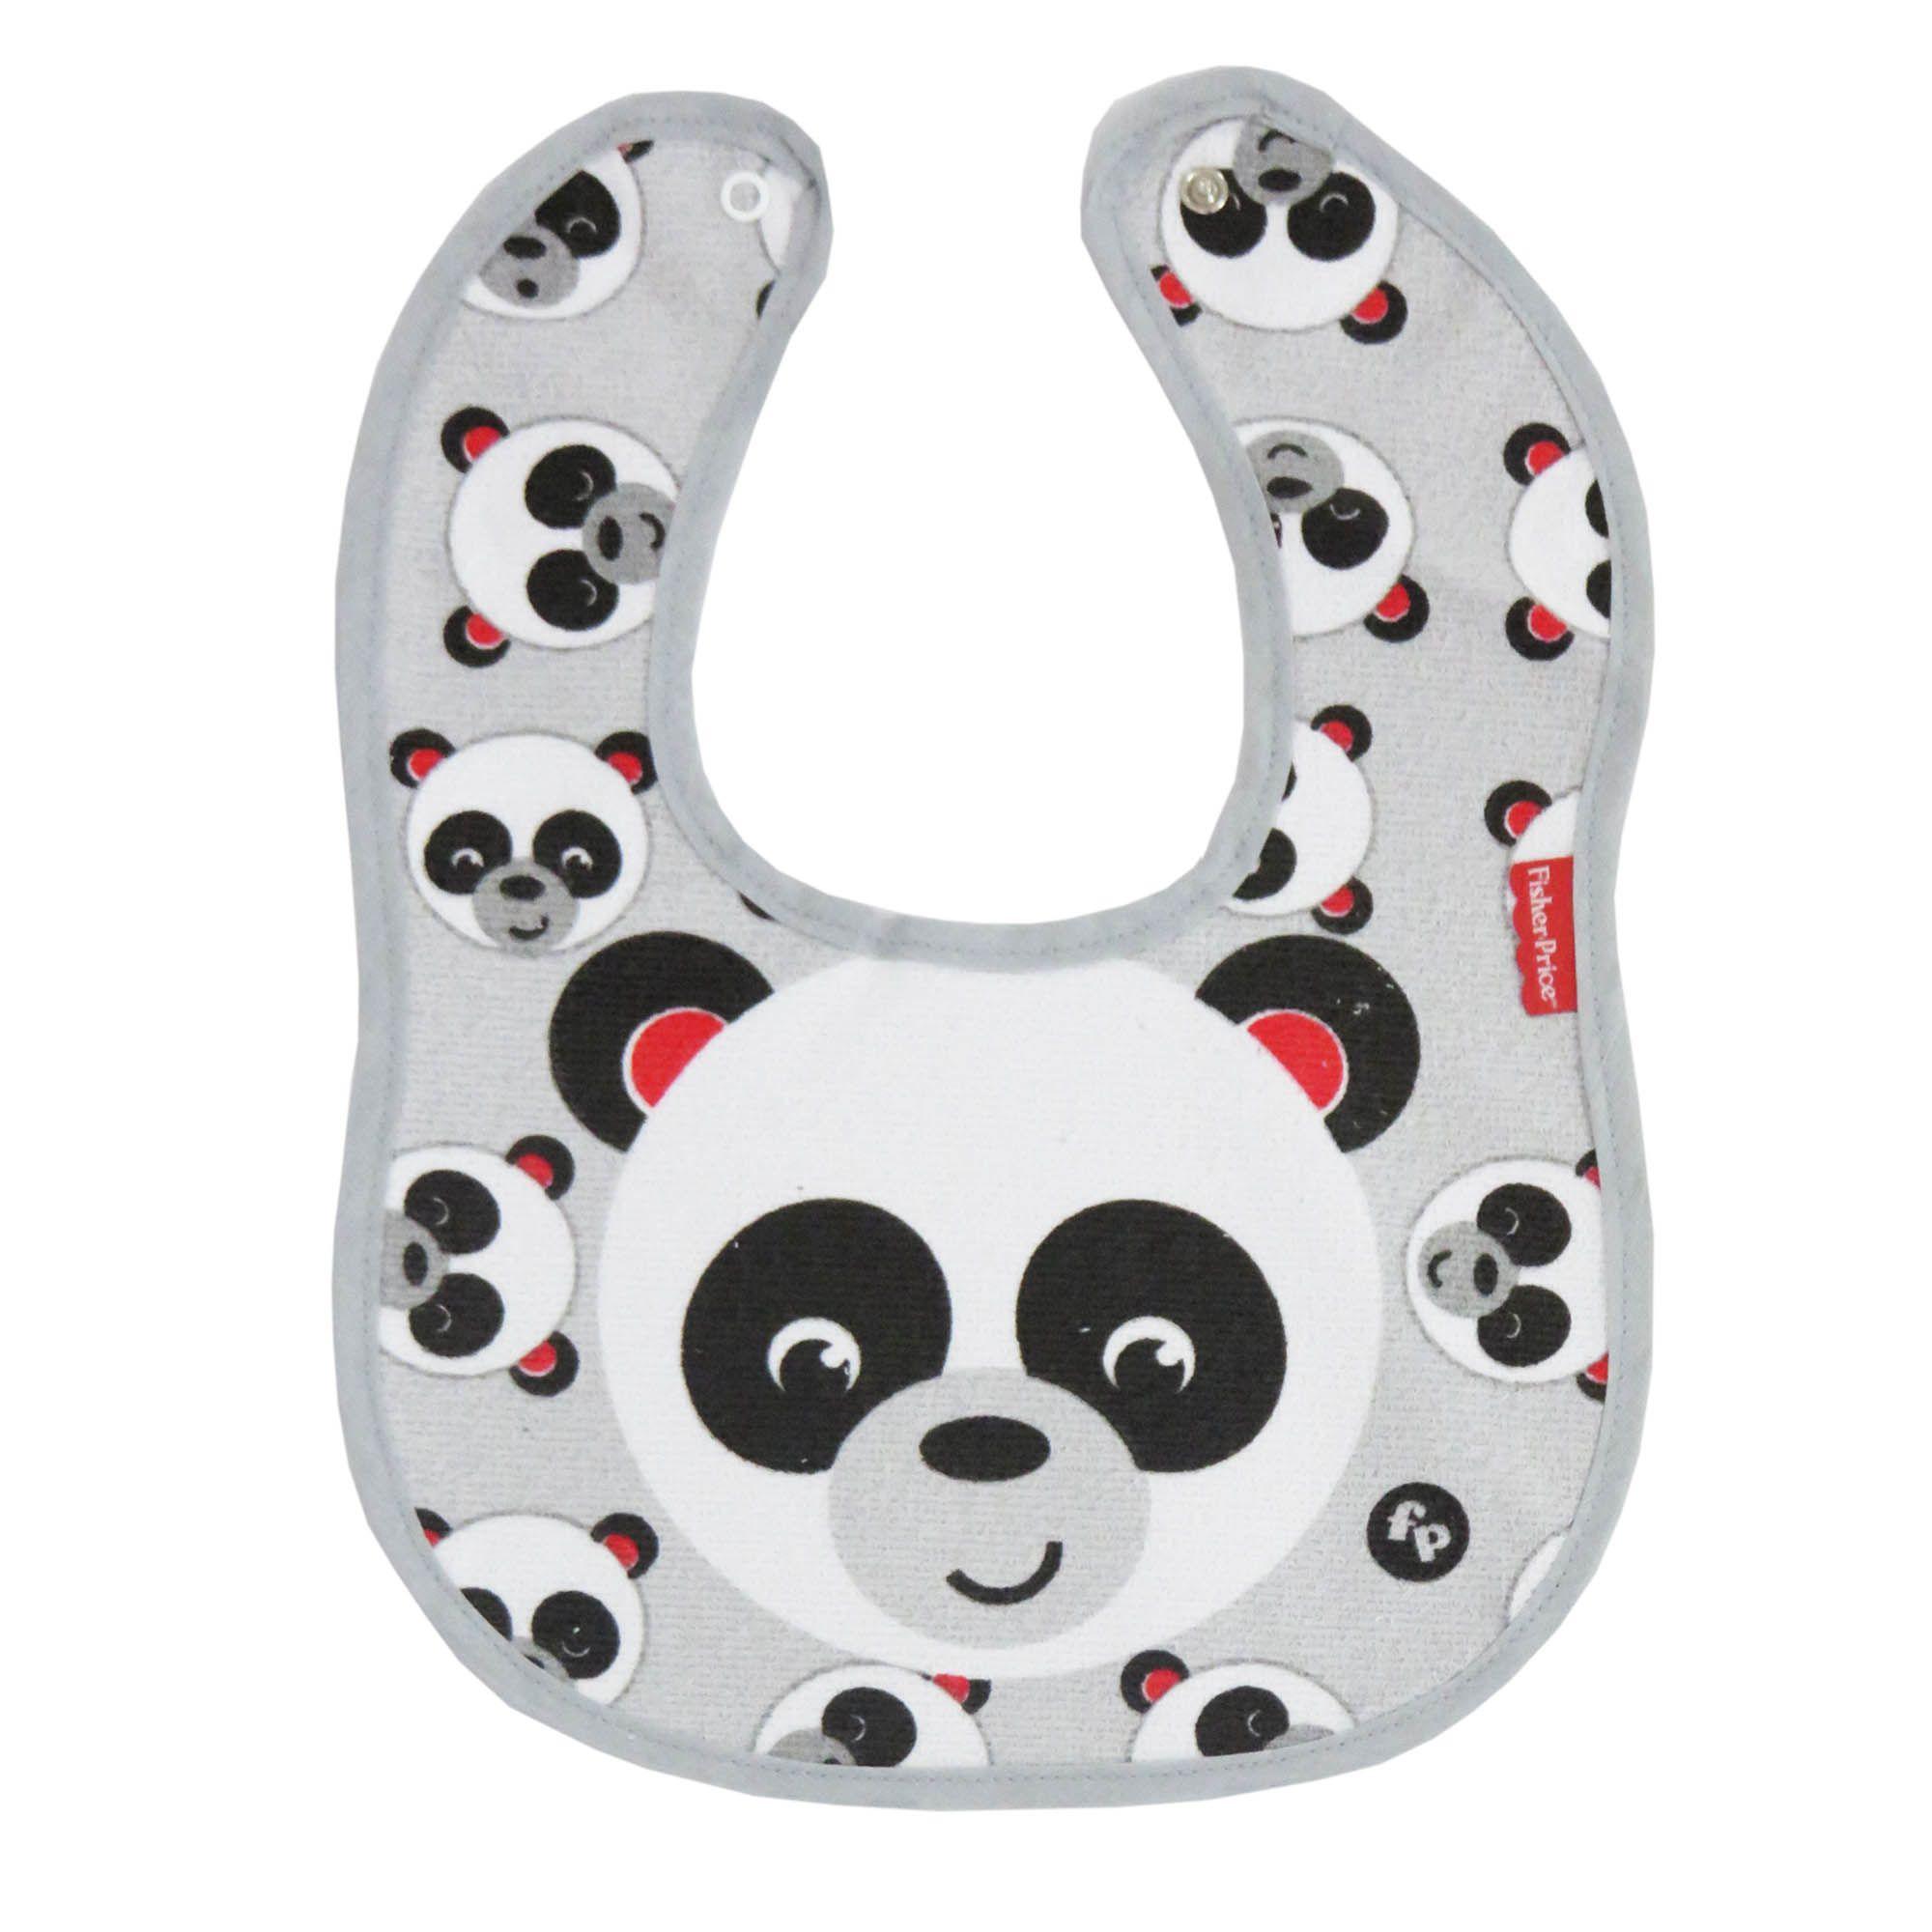 Babador Incomfral Fisher-Price - Anatômico Impermeável – Panda - Cinza Claro